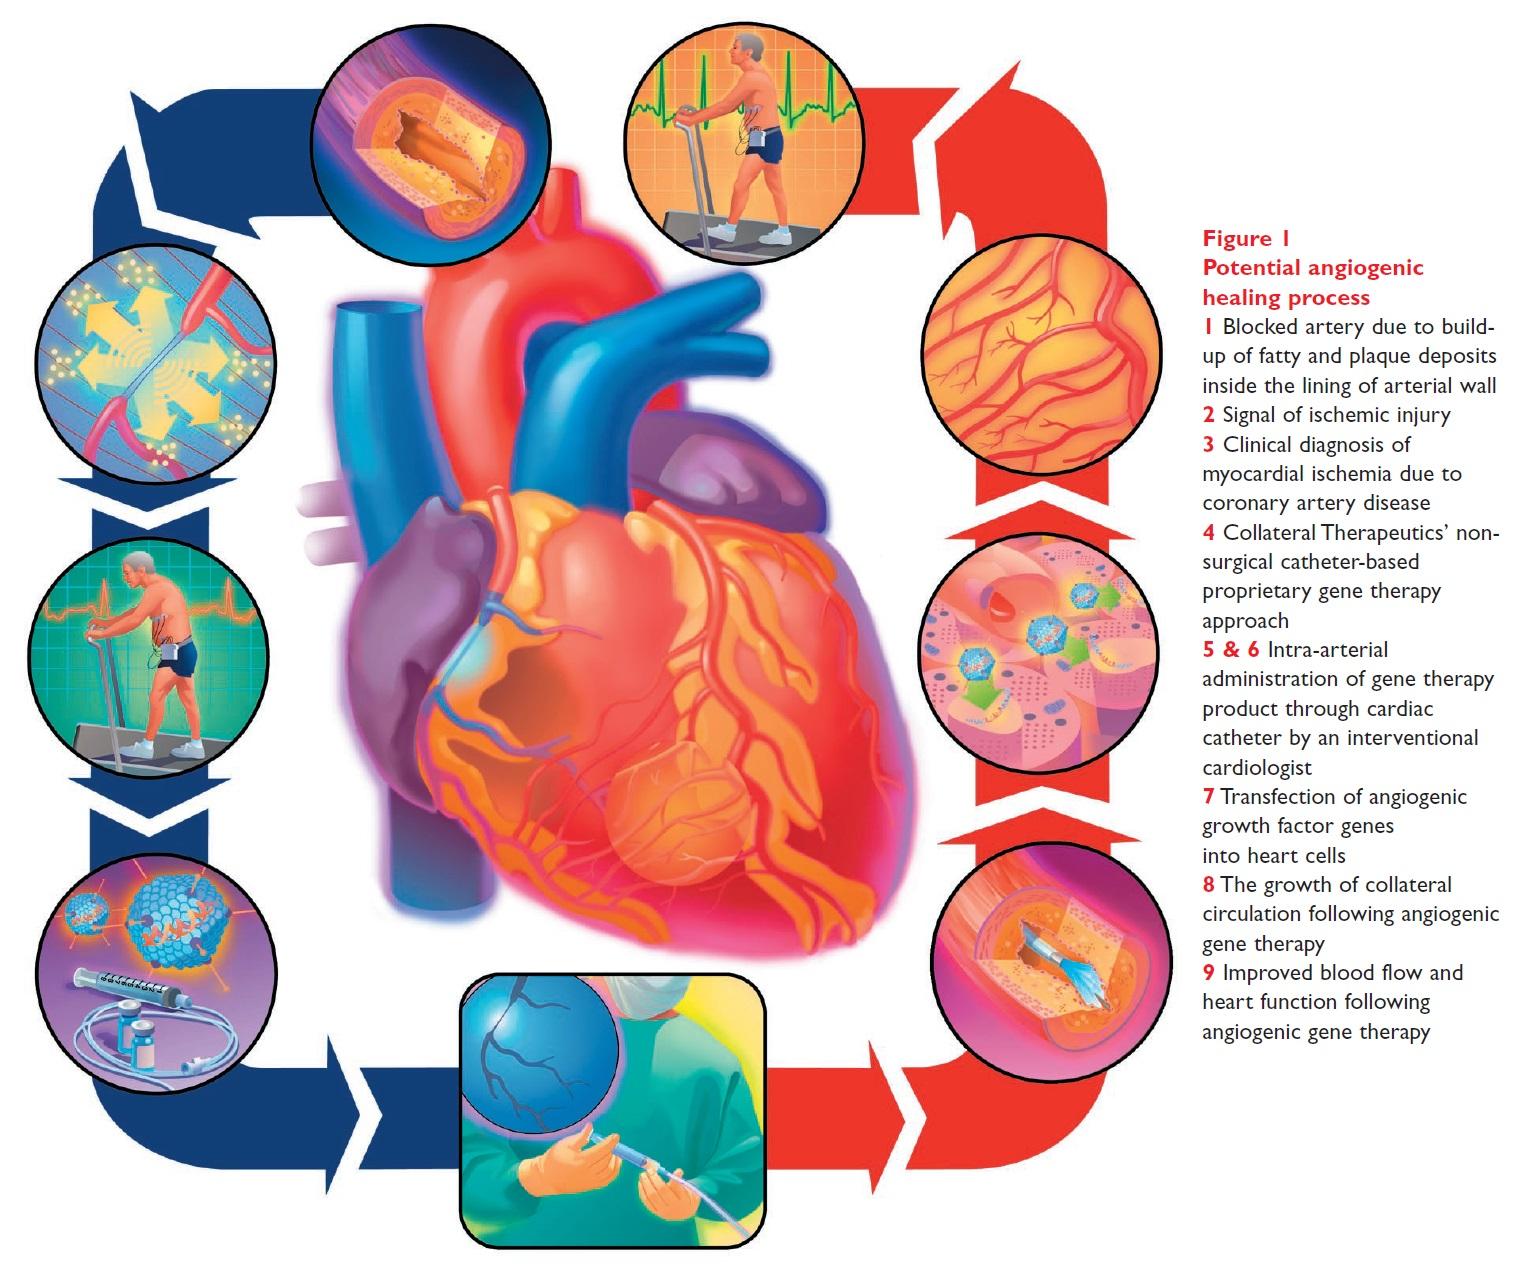 Figure 1 Potential angiogenic healing process